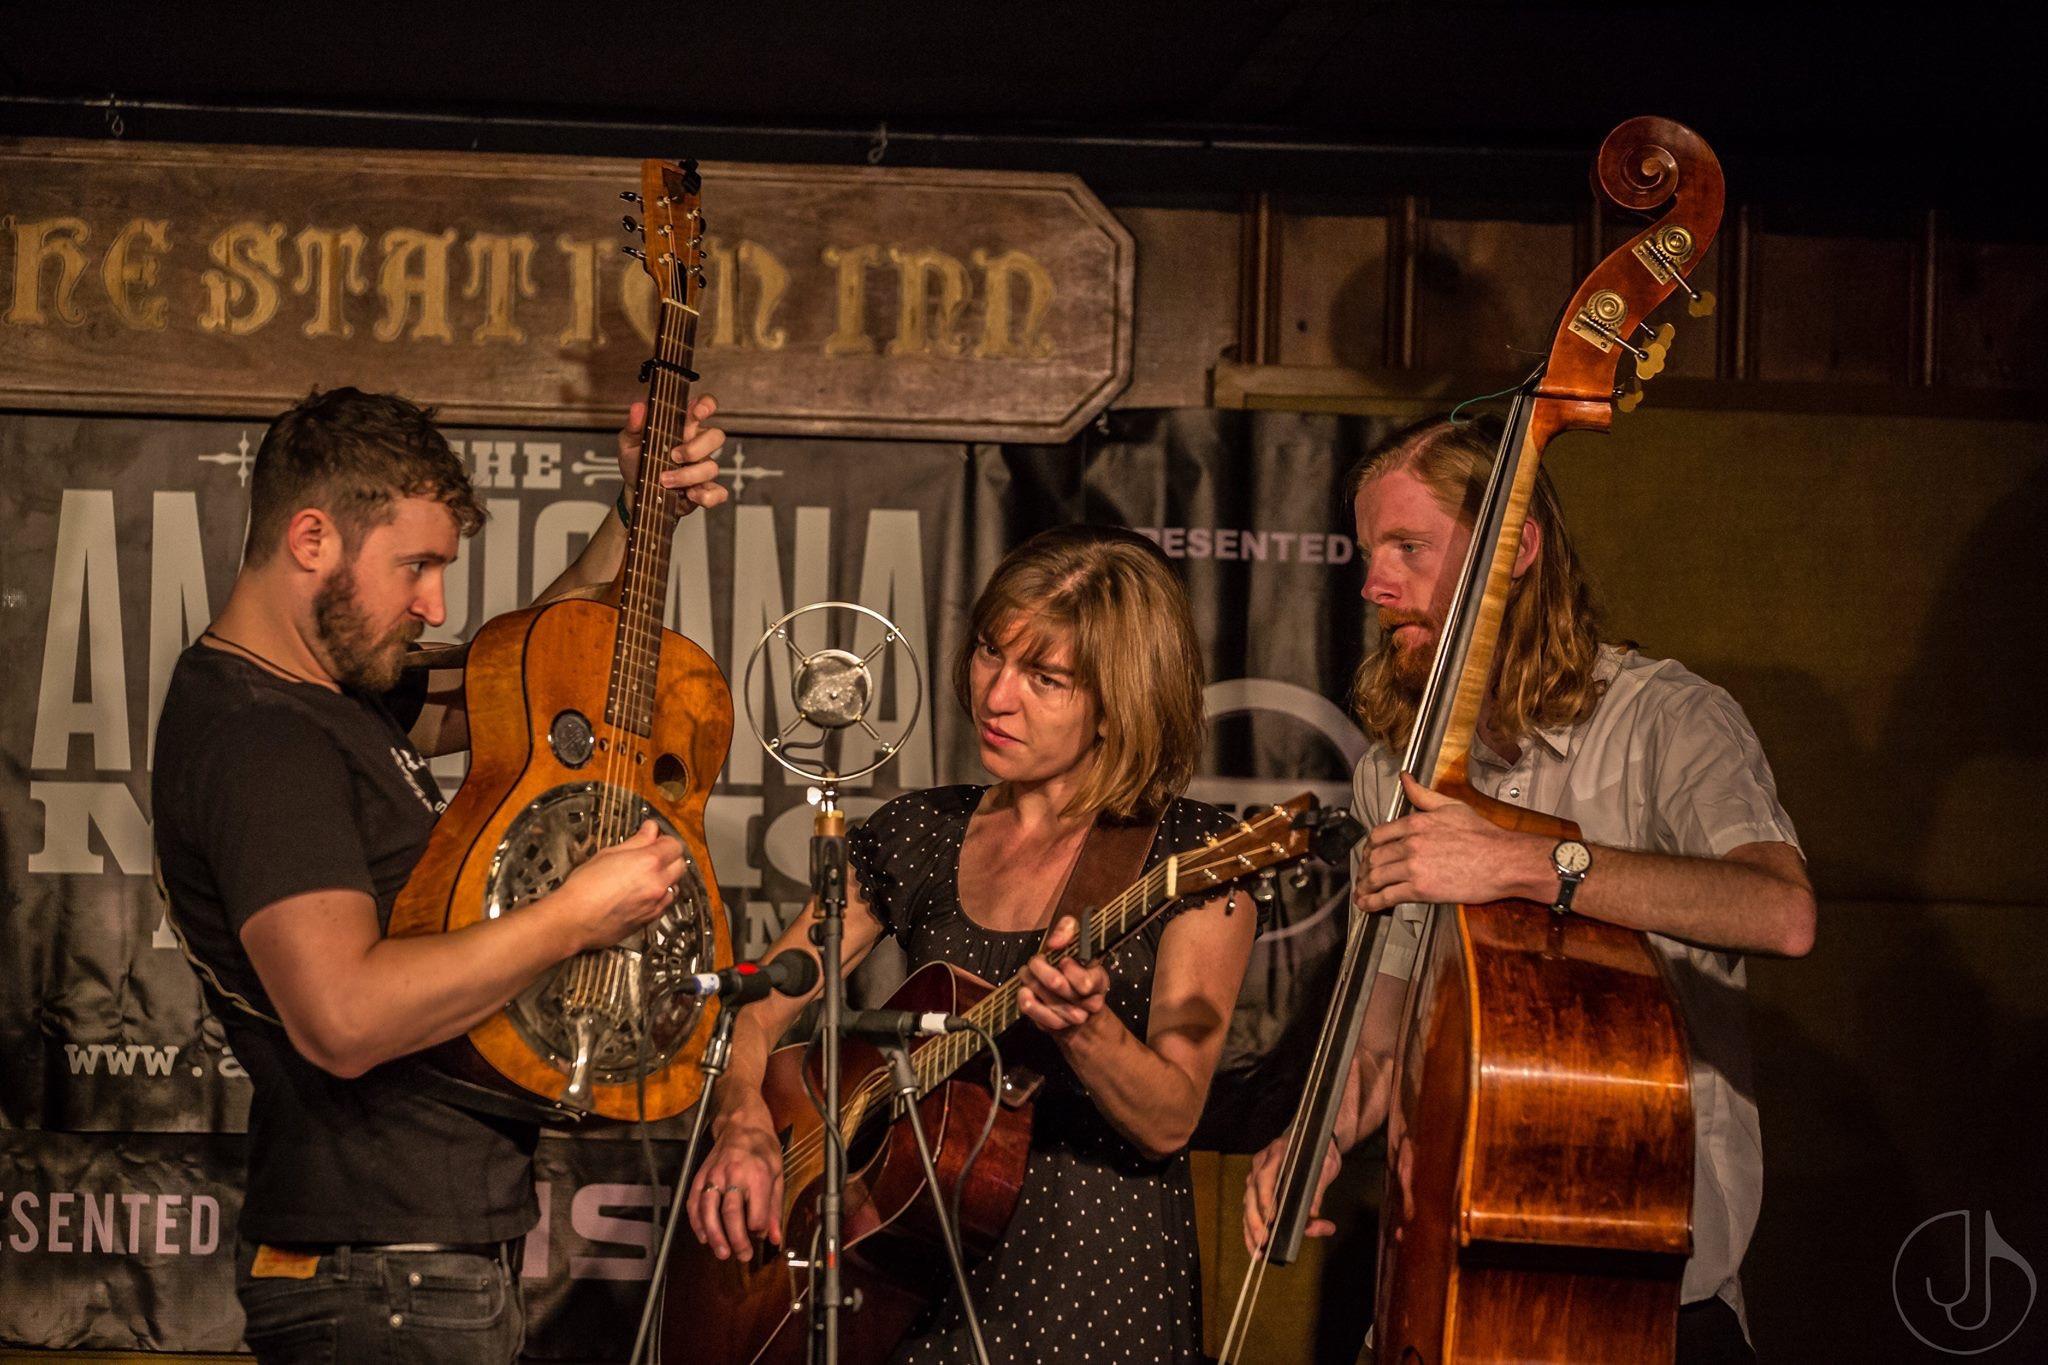 Total Tennessee Tour + Blue Ridge Mountain/Appalachian Experience